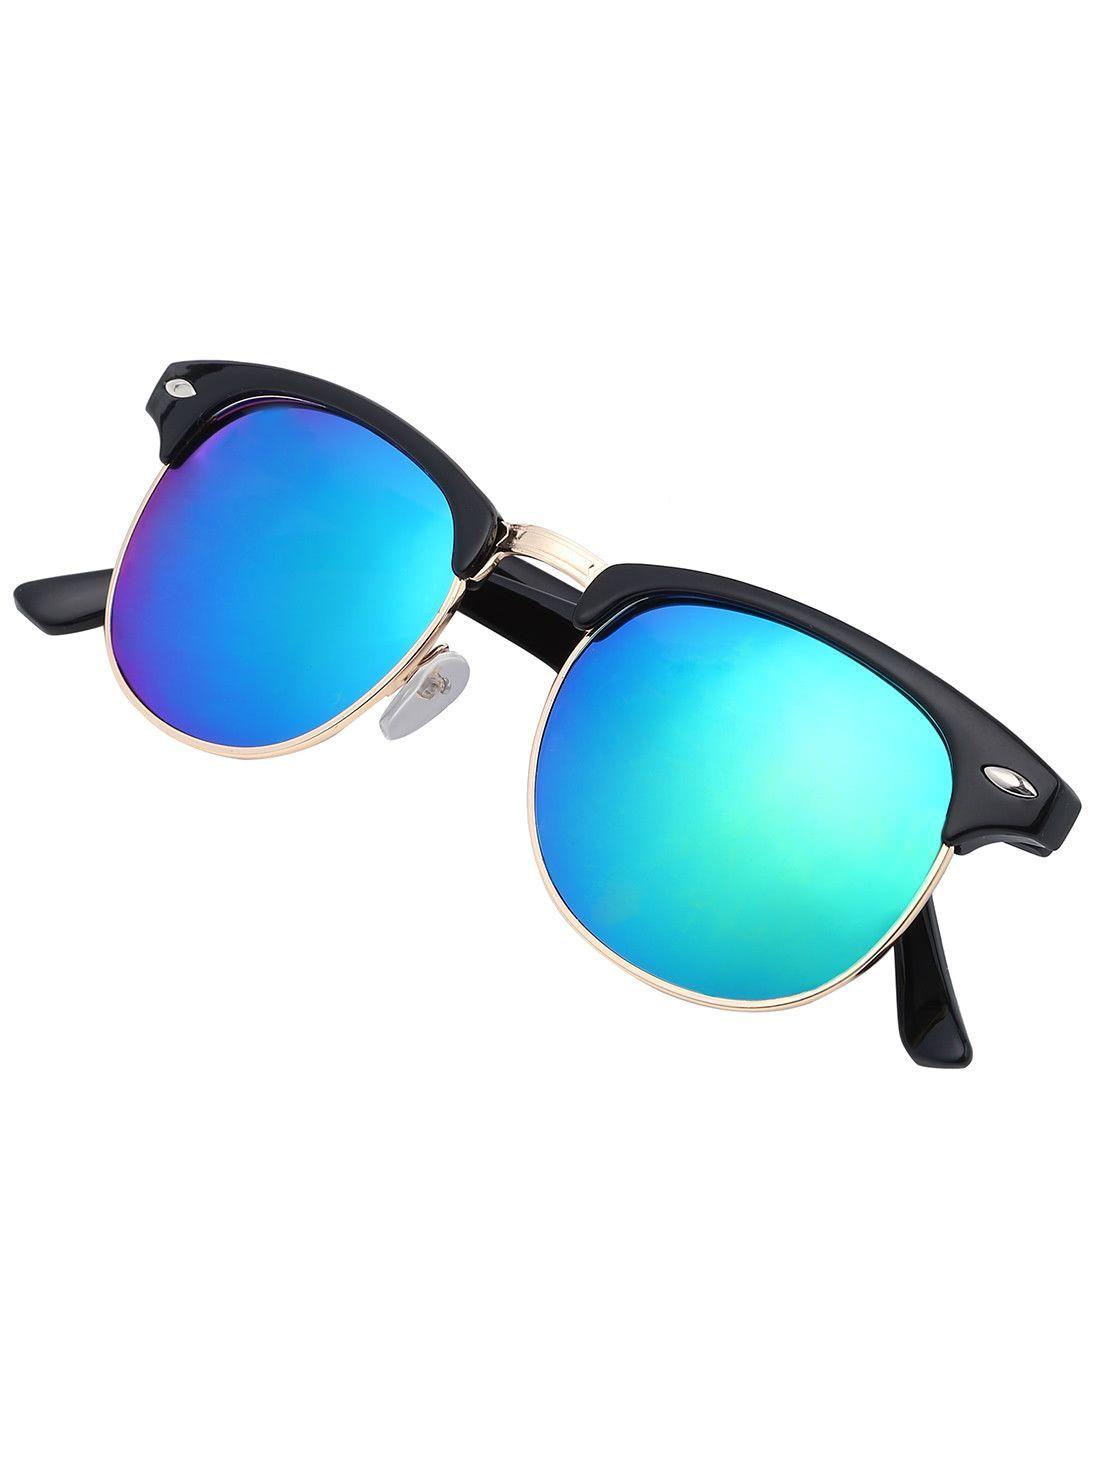 Browline Frame Mirrored Lenses Sunglasses | Beauty & Style | Pinterest